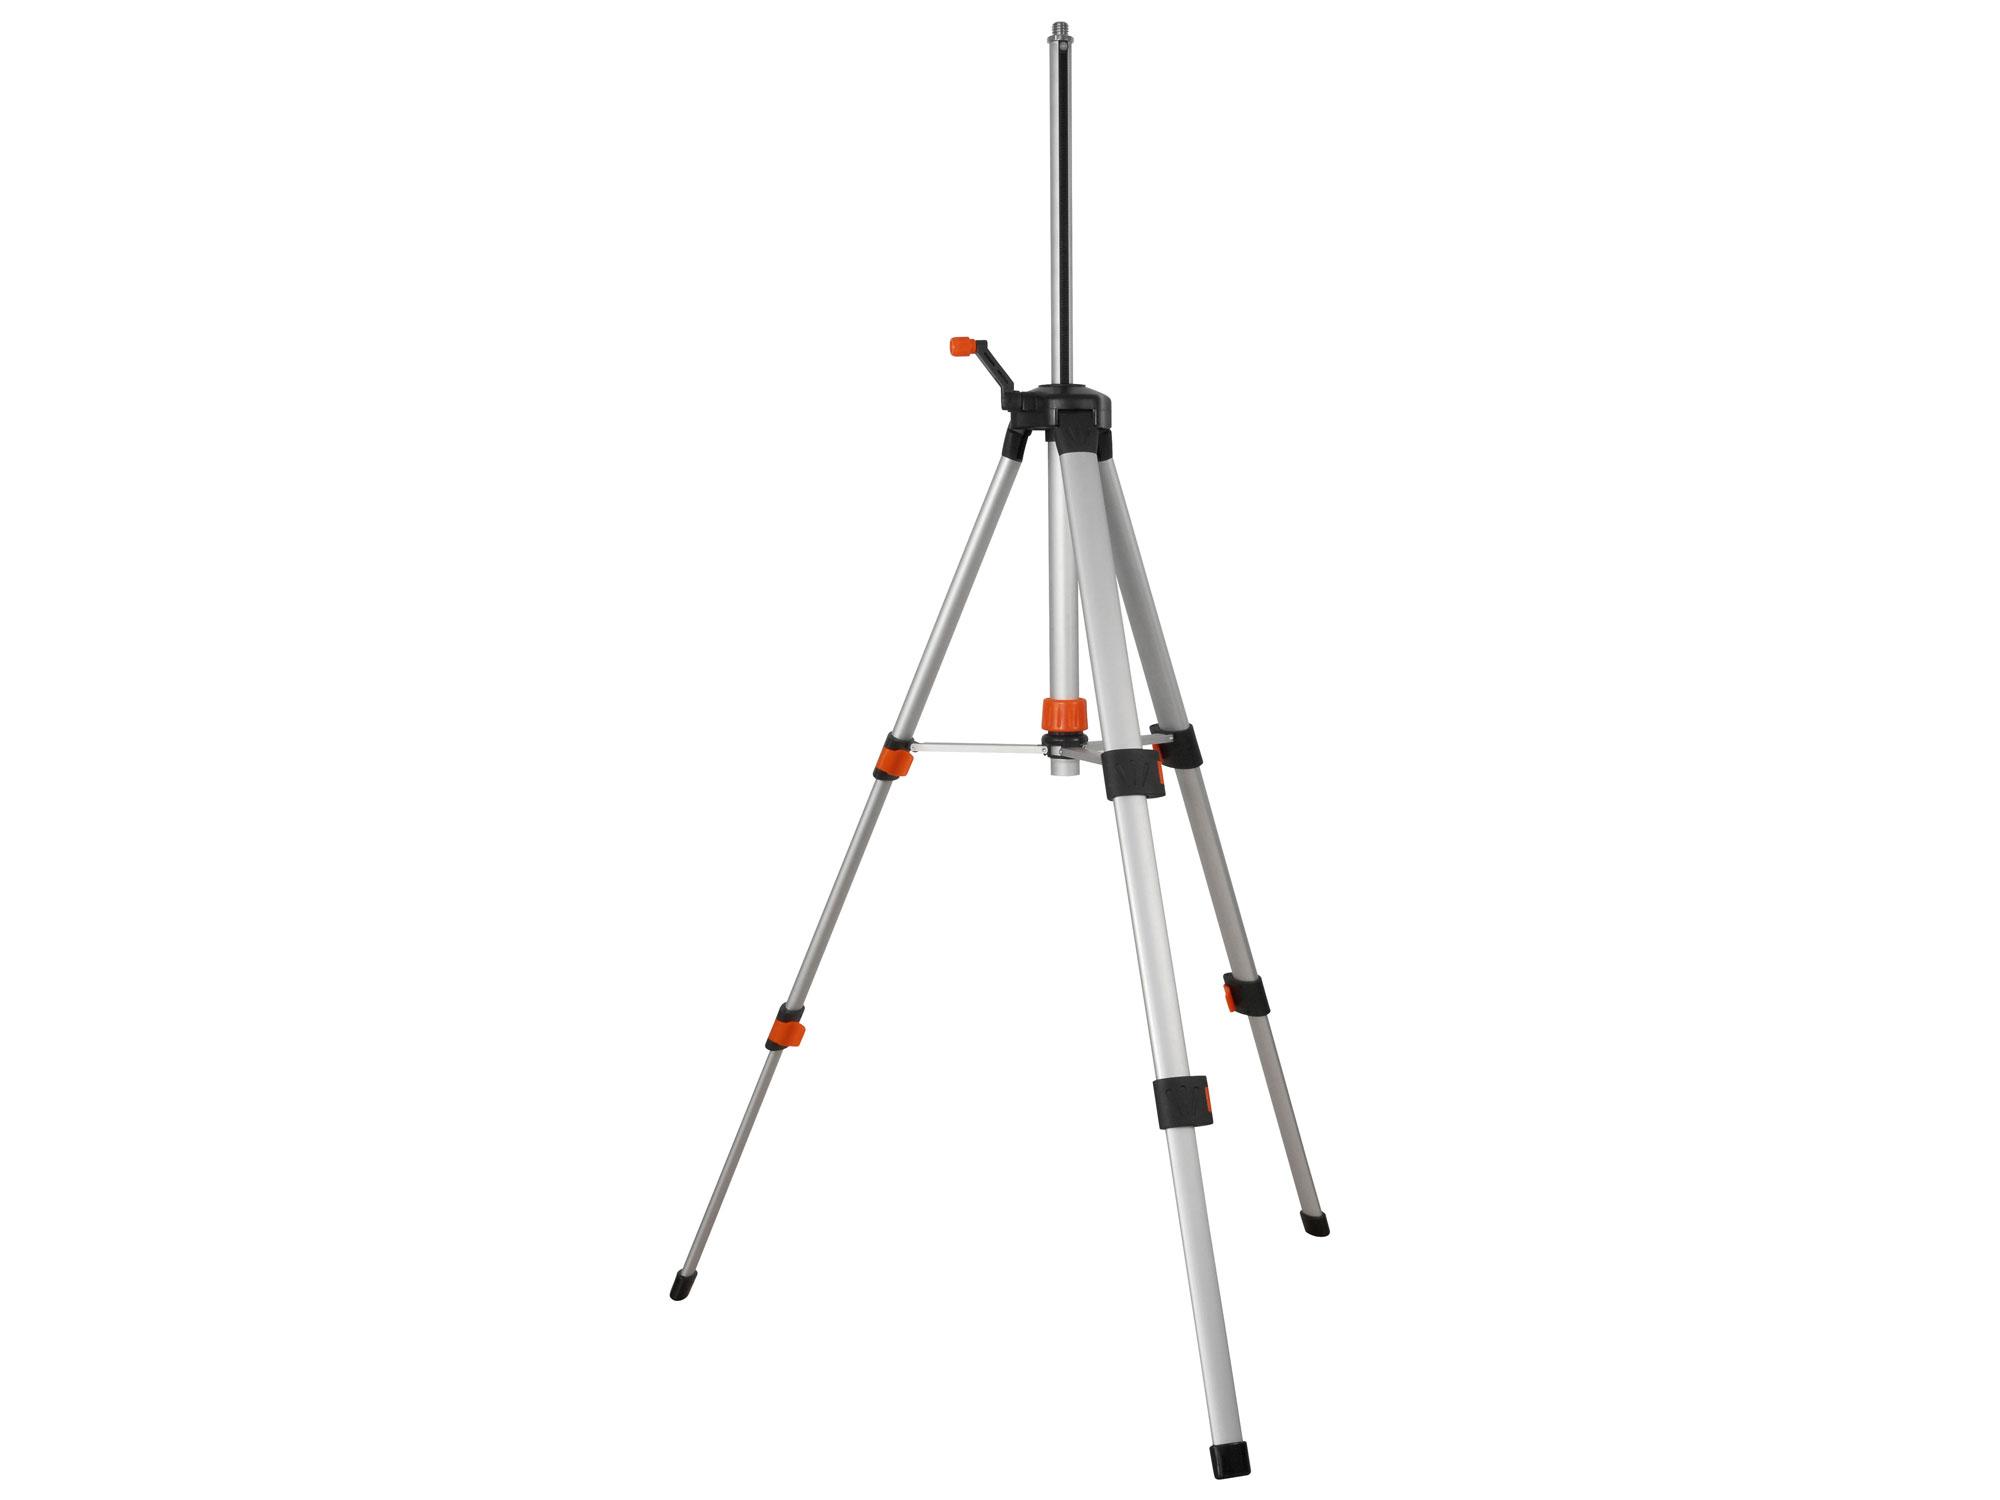 Stativ výsuvný, 420-1200mm EXTOL PREMIUM 8823900